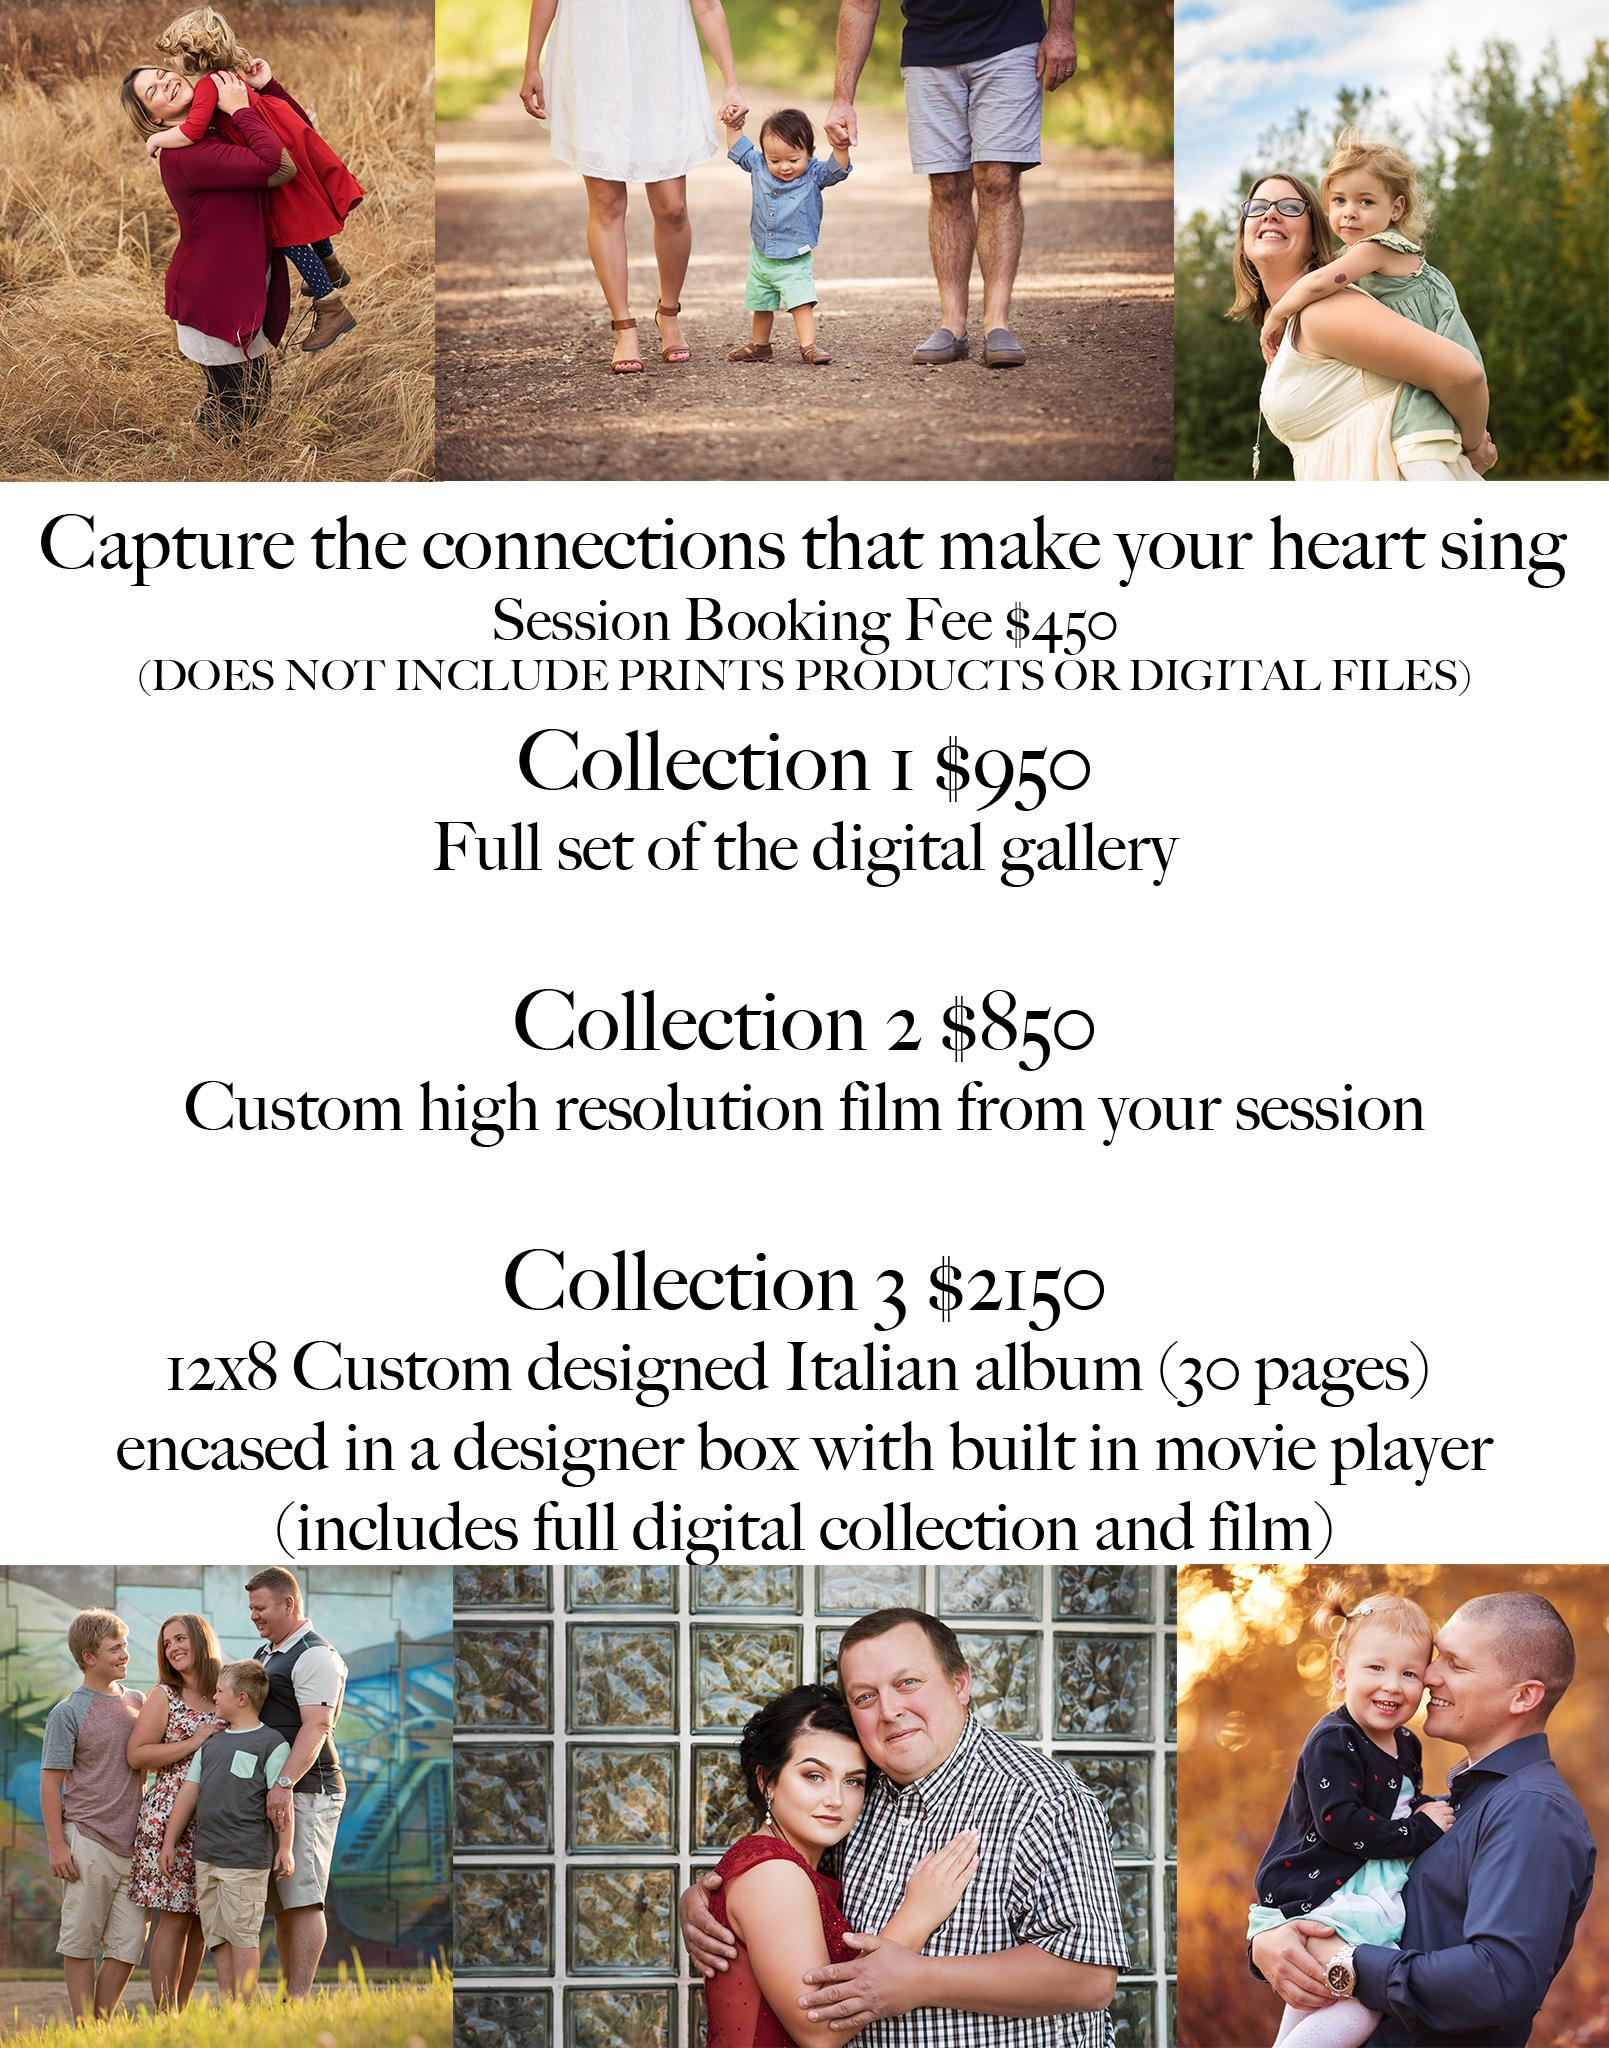 Pricing, best, quality, heirloom, fort mcmurray photographer, experience, video, film, alberta, family, graduate, newborn, birthday, anniversary gift,